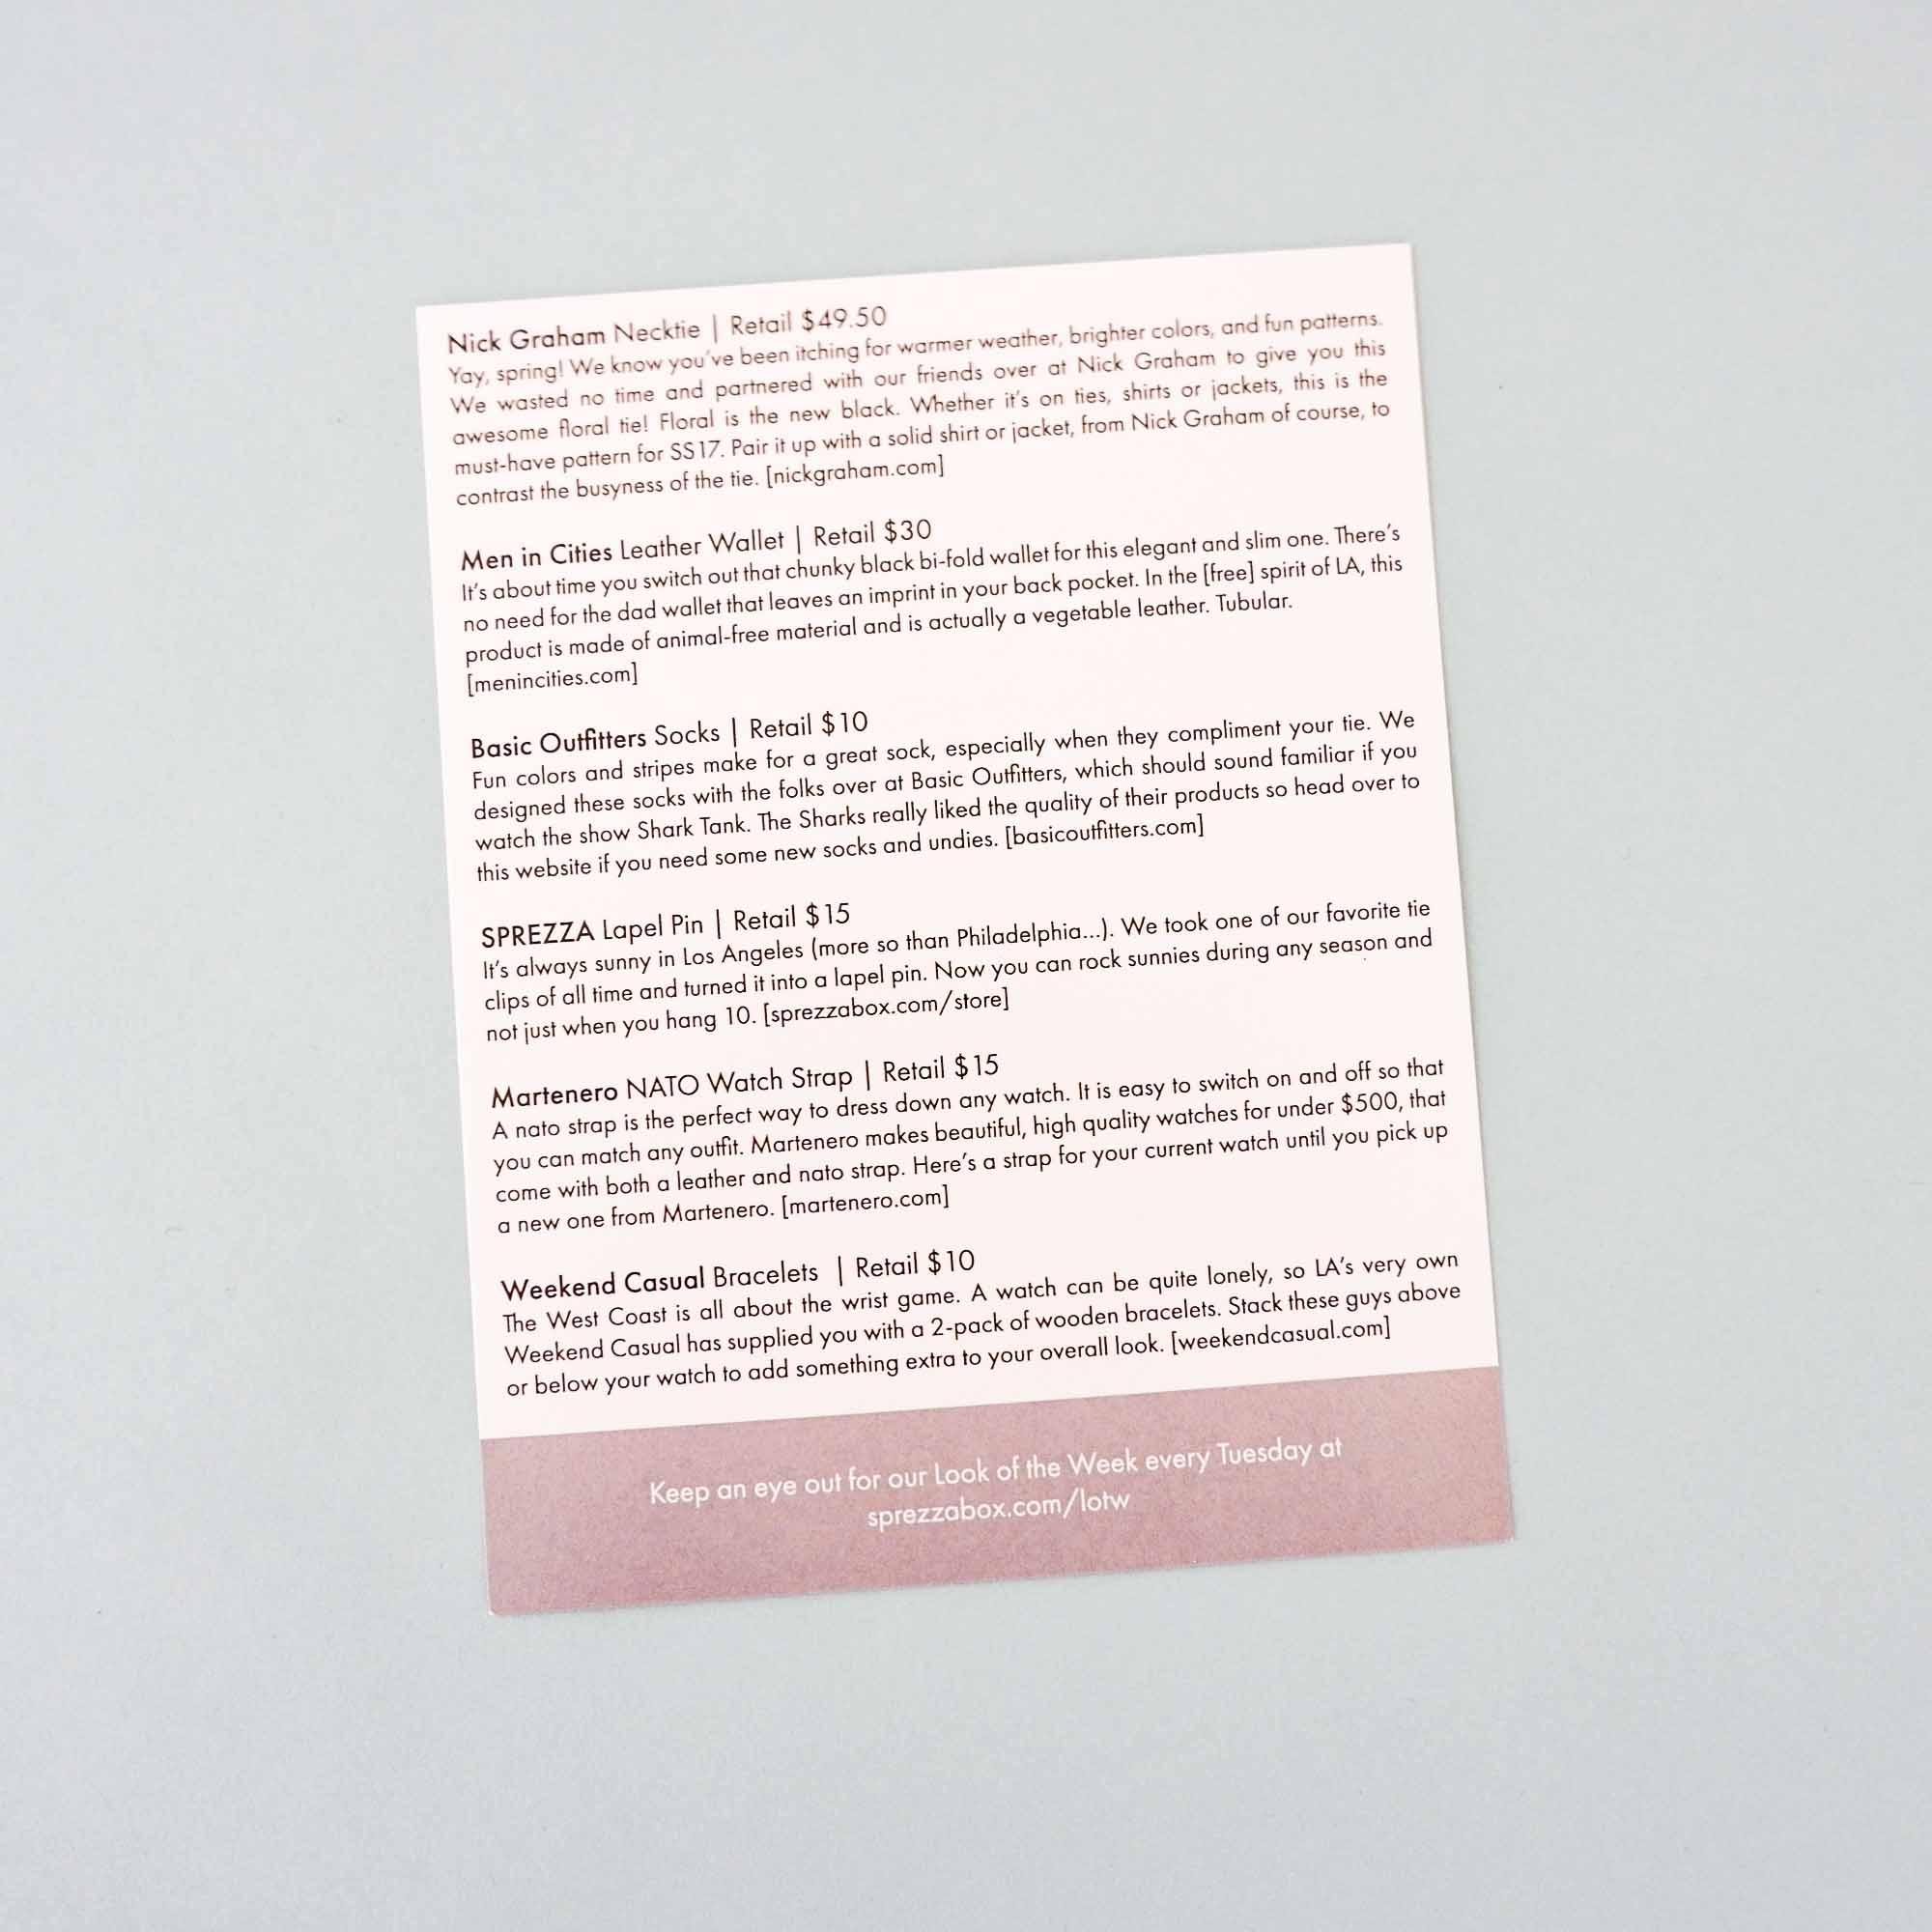 Info Card Back